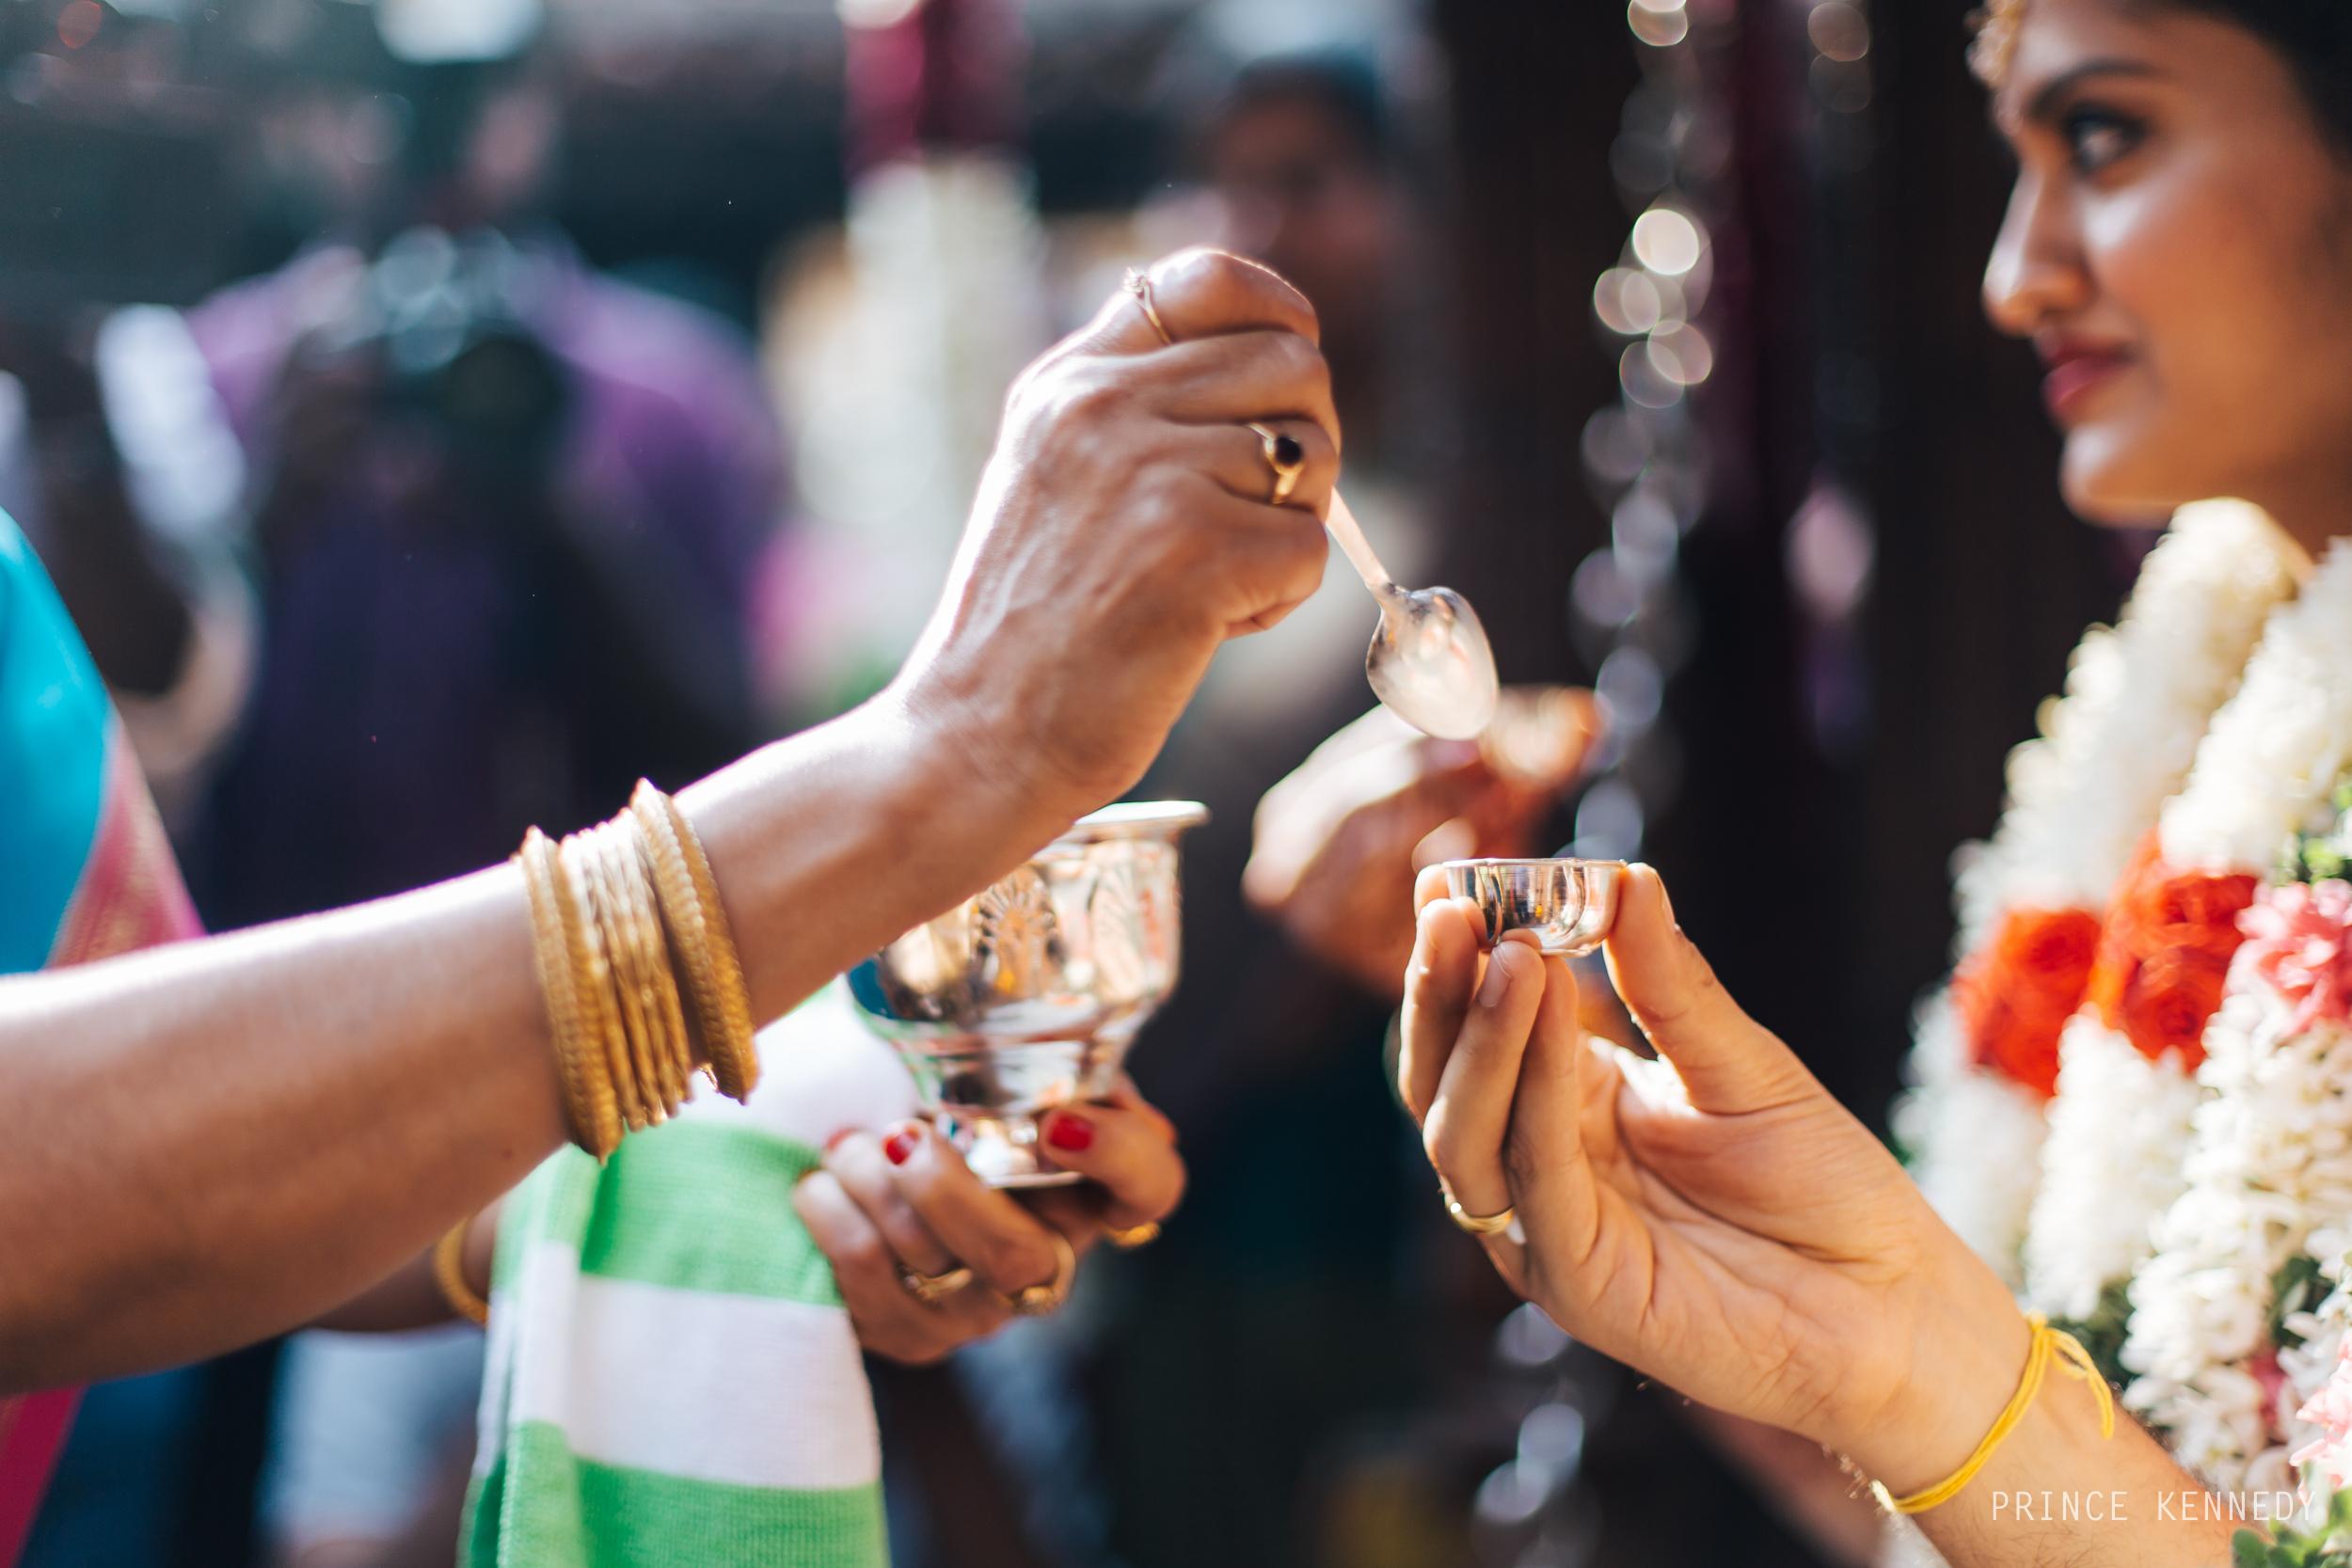 Athmajja-Nithesh-Engagement-Couple-Portrait-Portraiture-Wedding-Couple-Portrait-Chennai-Photographer-Candid-Photography-Destination-Best-Prince-Kennedy-Photography-146.jpg